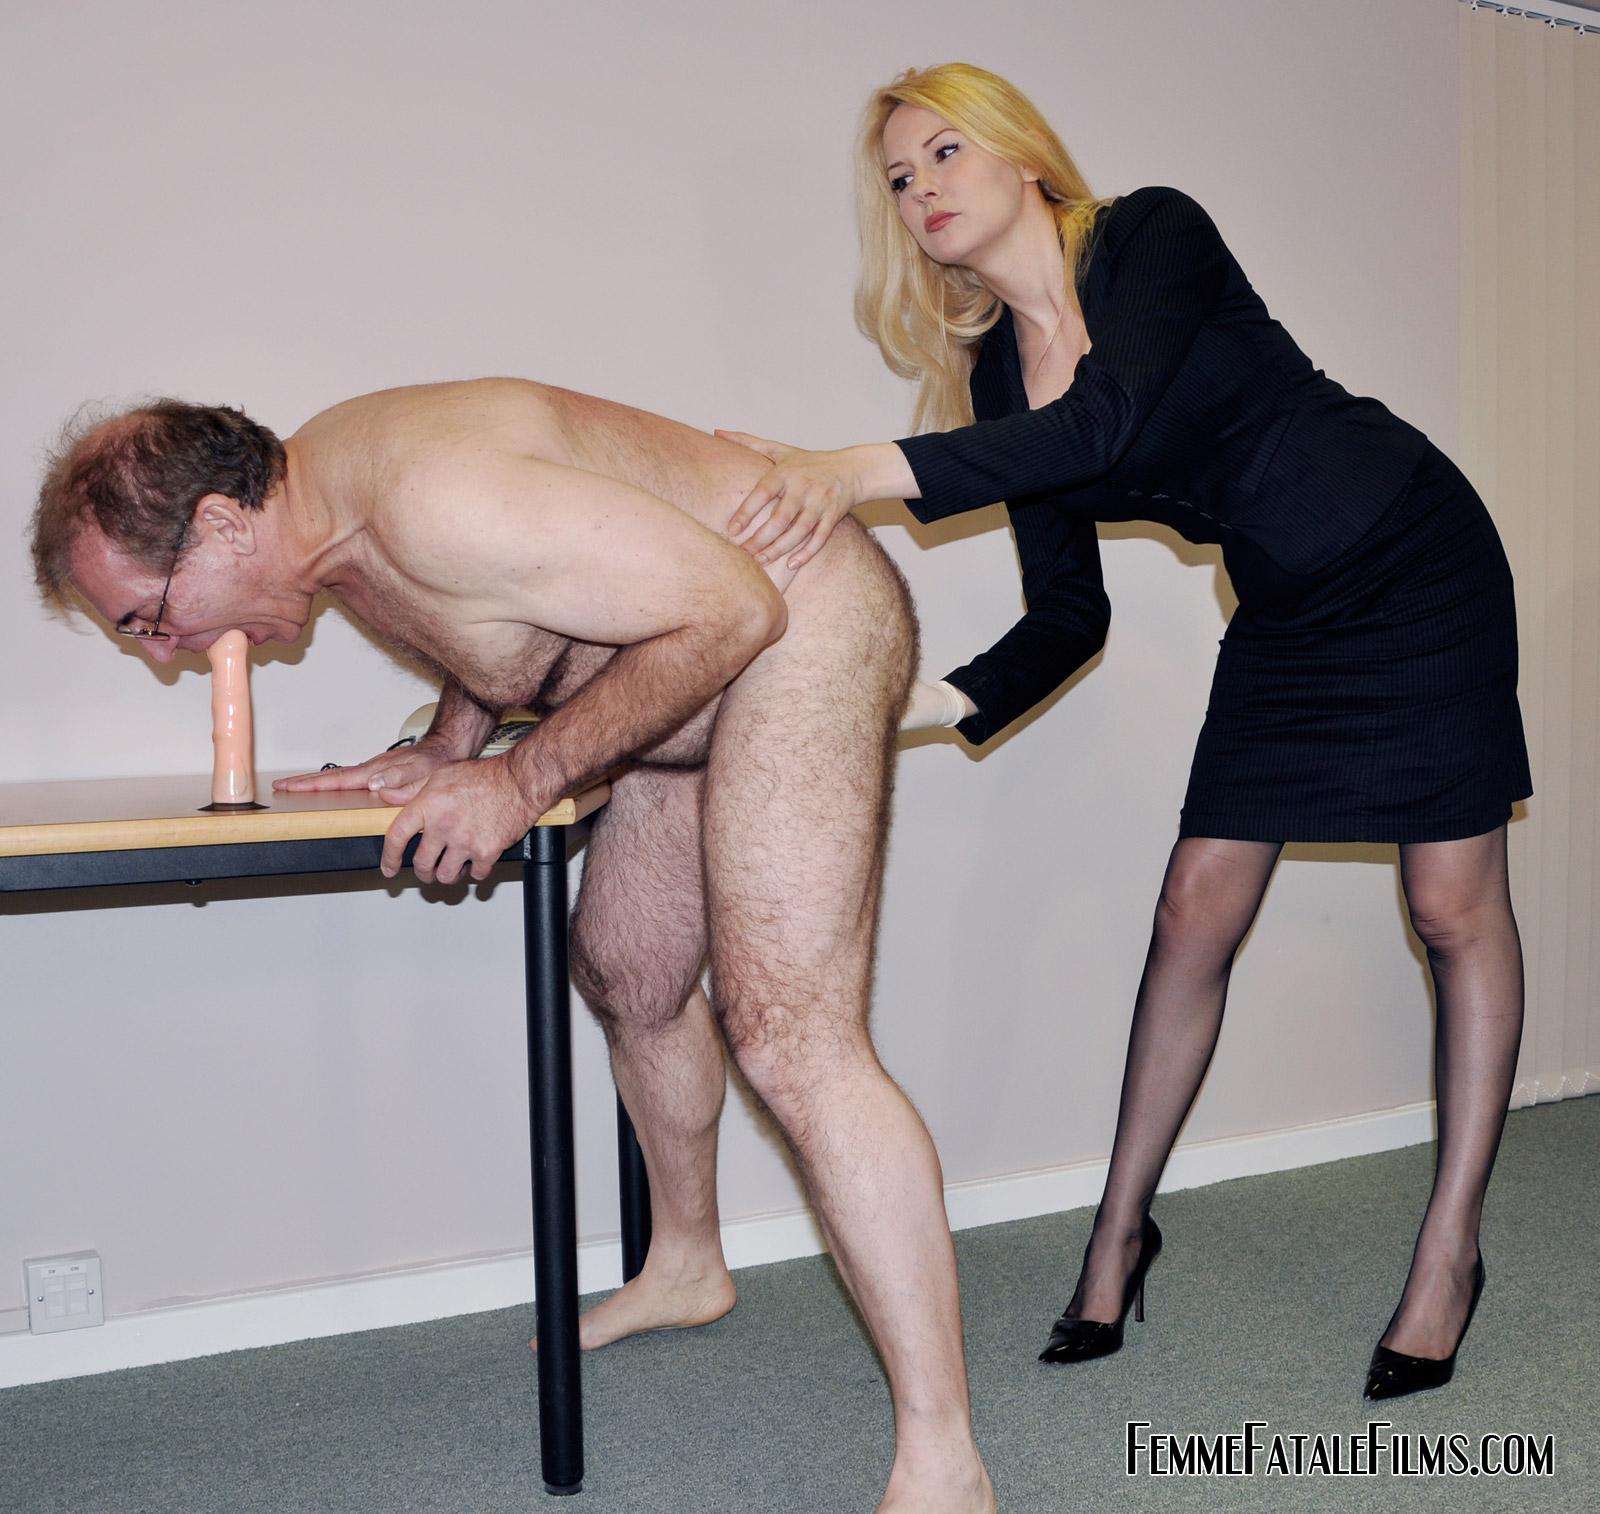 Femme fatale porn